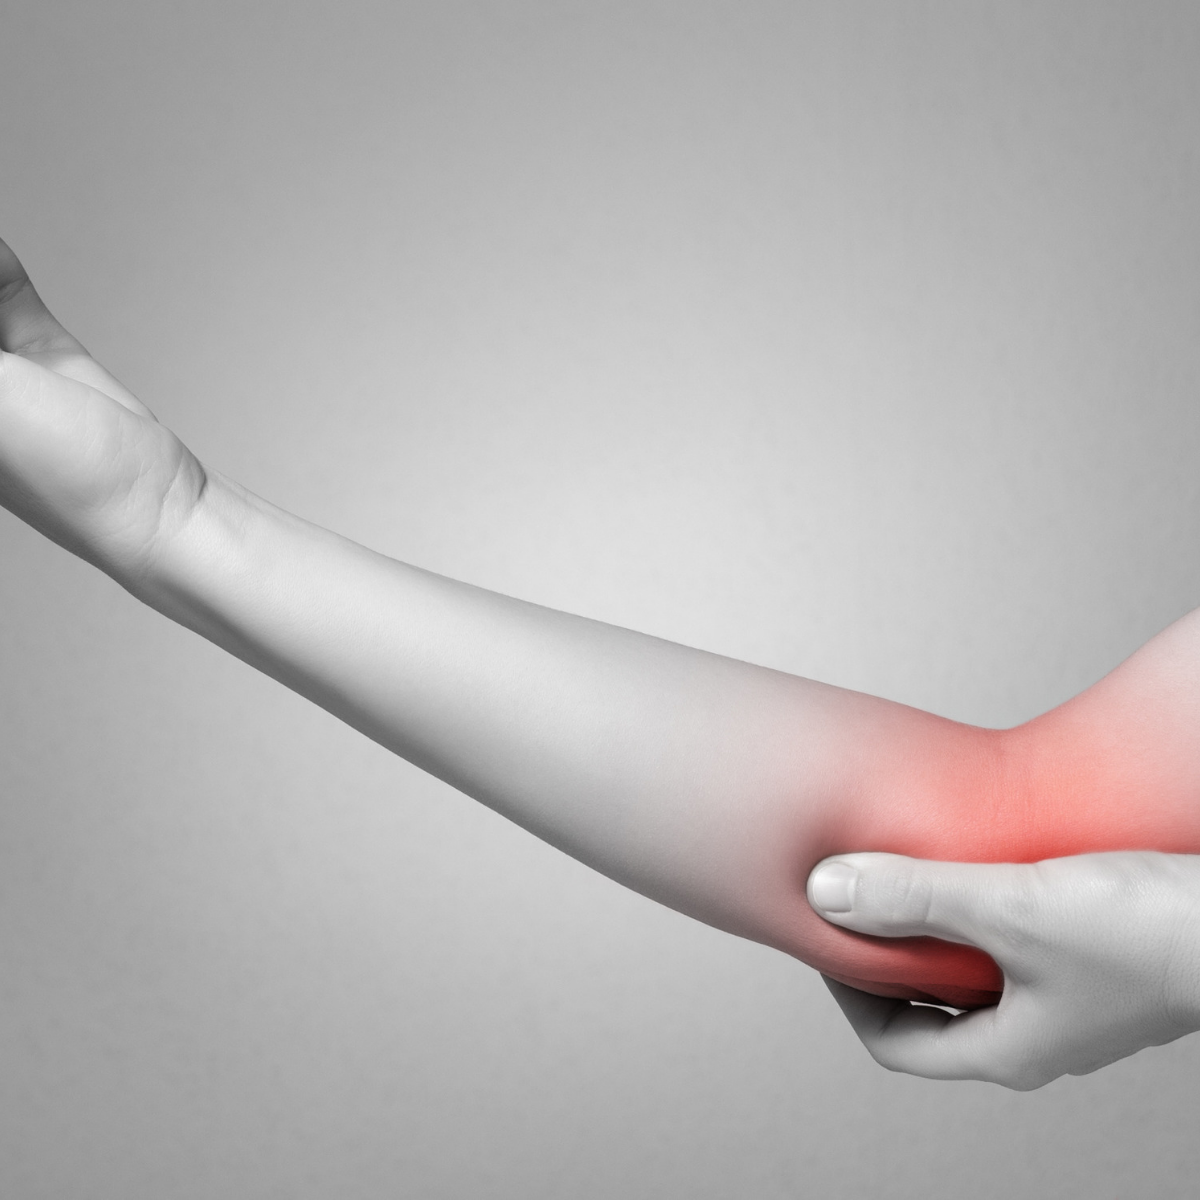 Can acupuncture help Rheumatoid Arthritis? | Starting ...